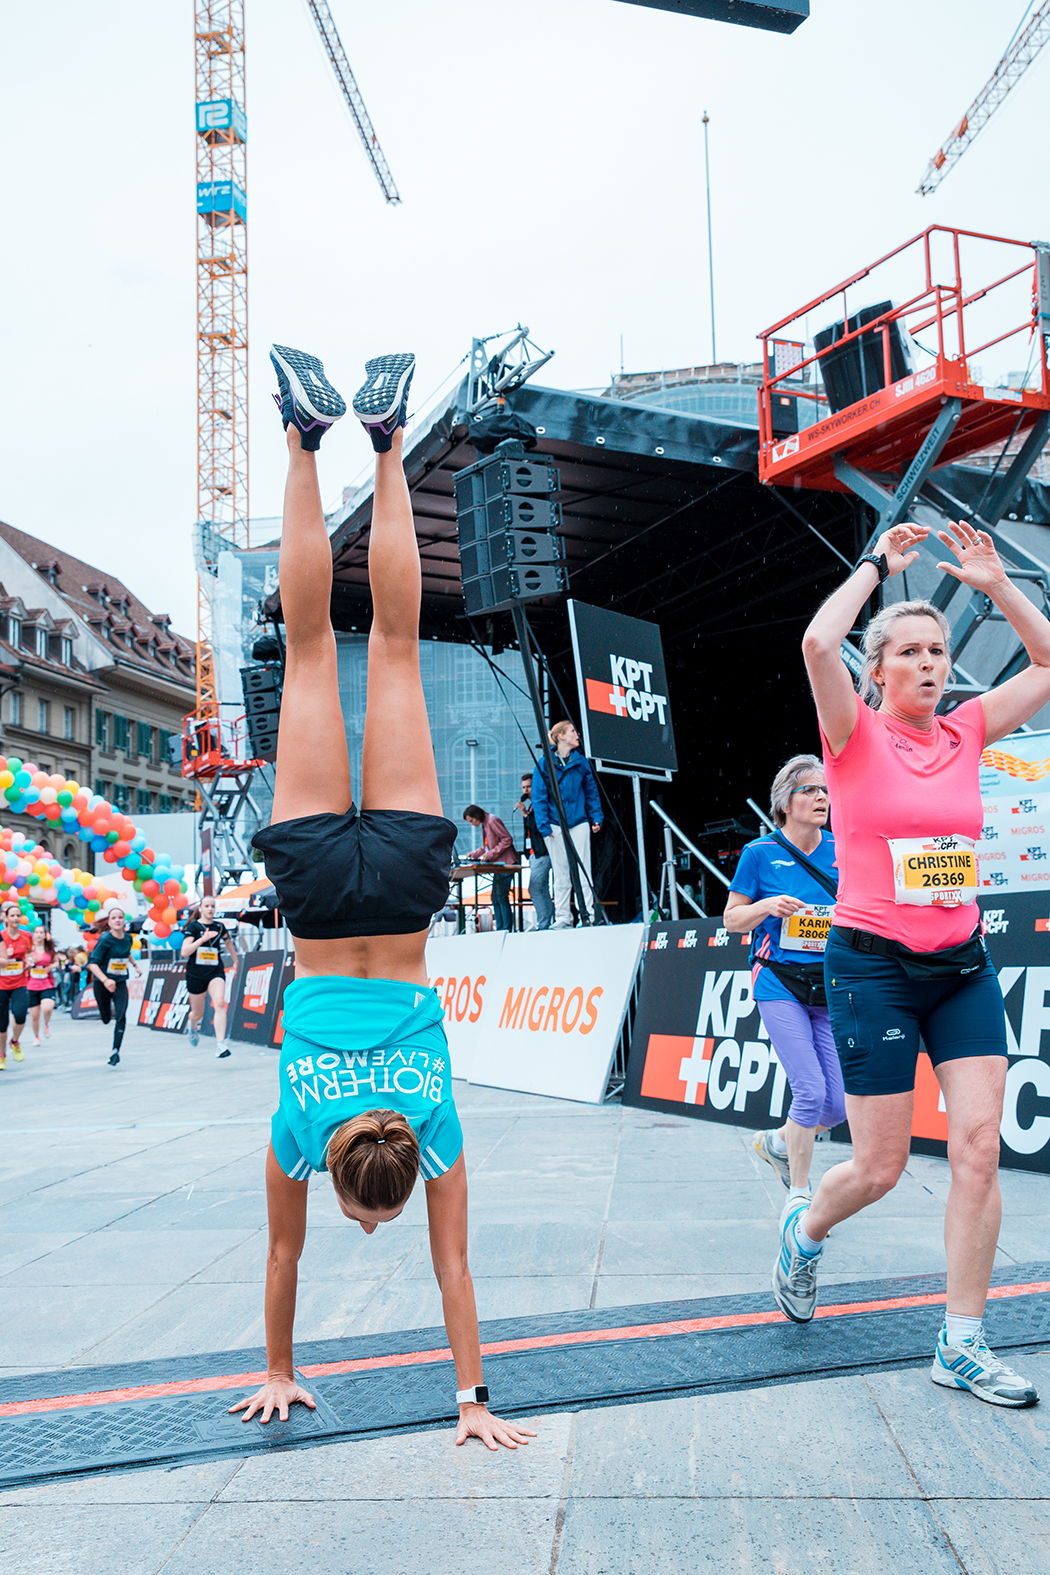 Fitnessblog-Fitnessblogger-Fitness-Blog-Blogger-Frauenlauf-Bern-Biotherm-livemore-12-web